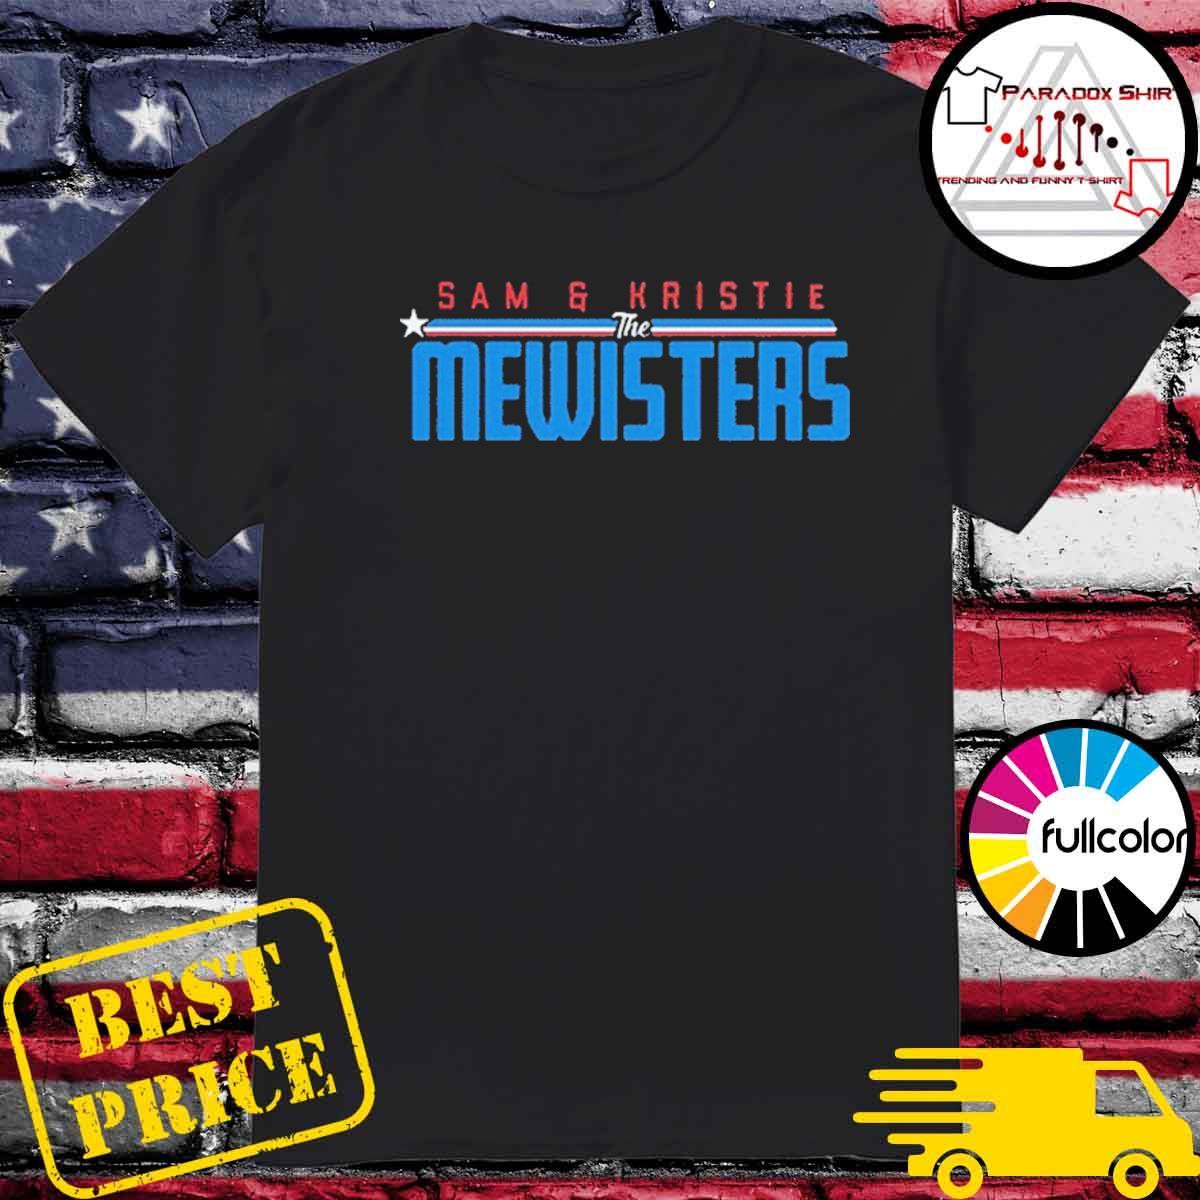 Sam & Kristie the mewisters shirt